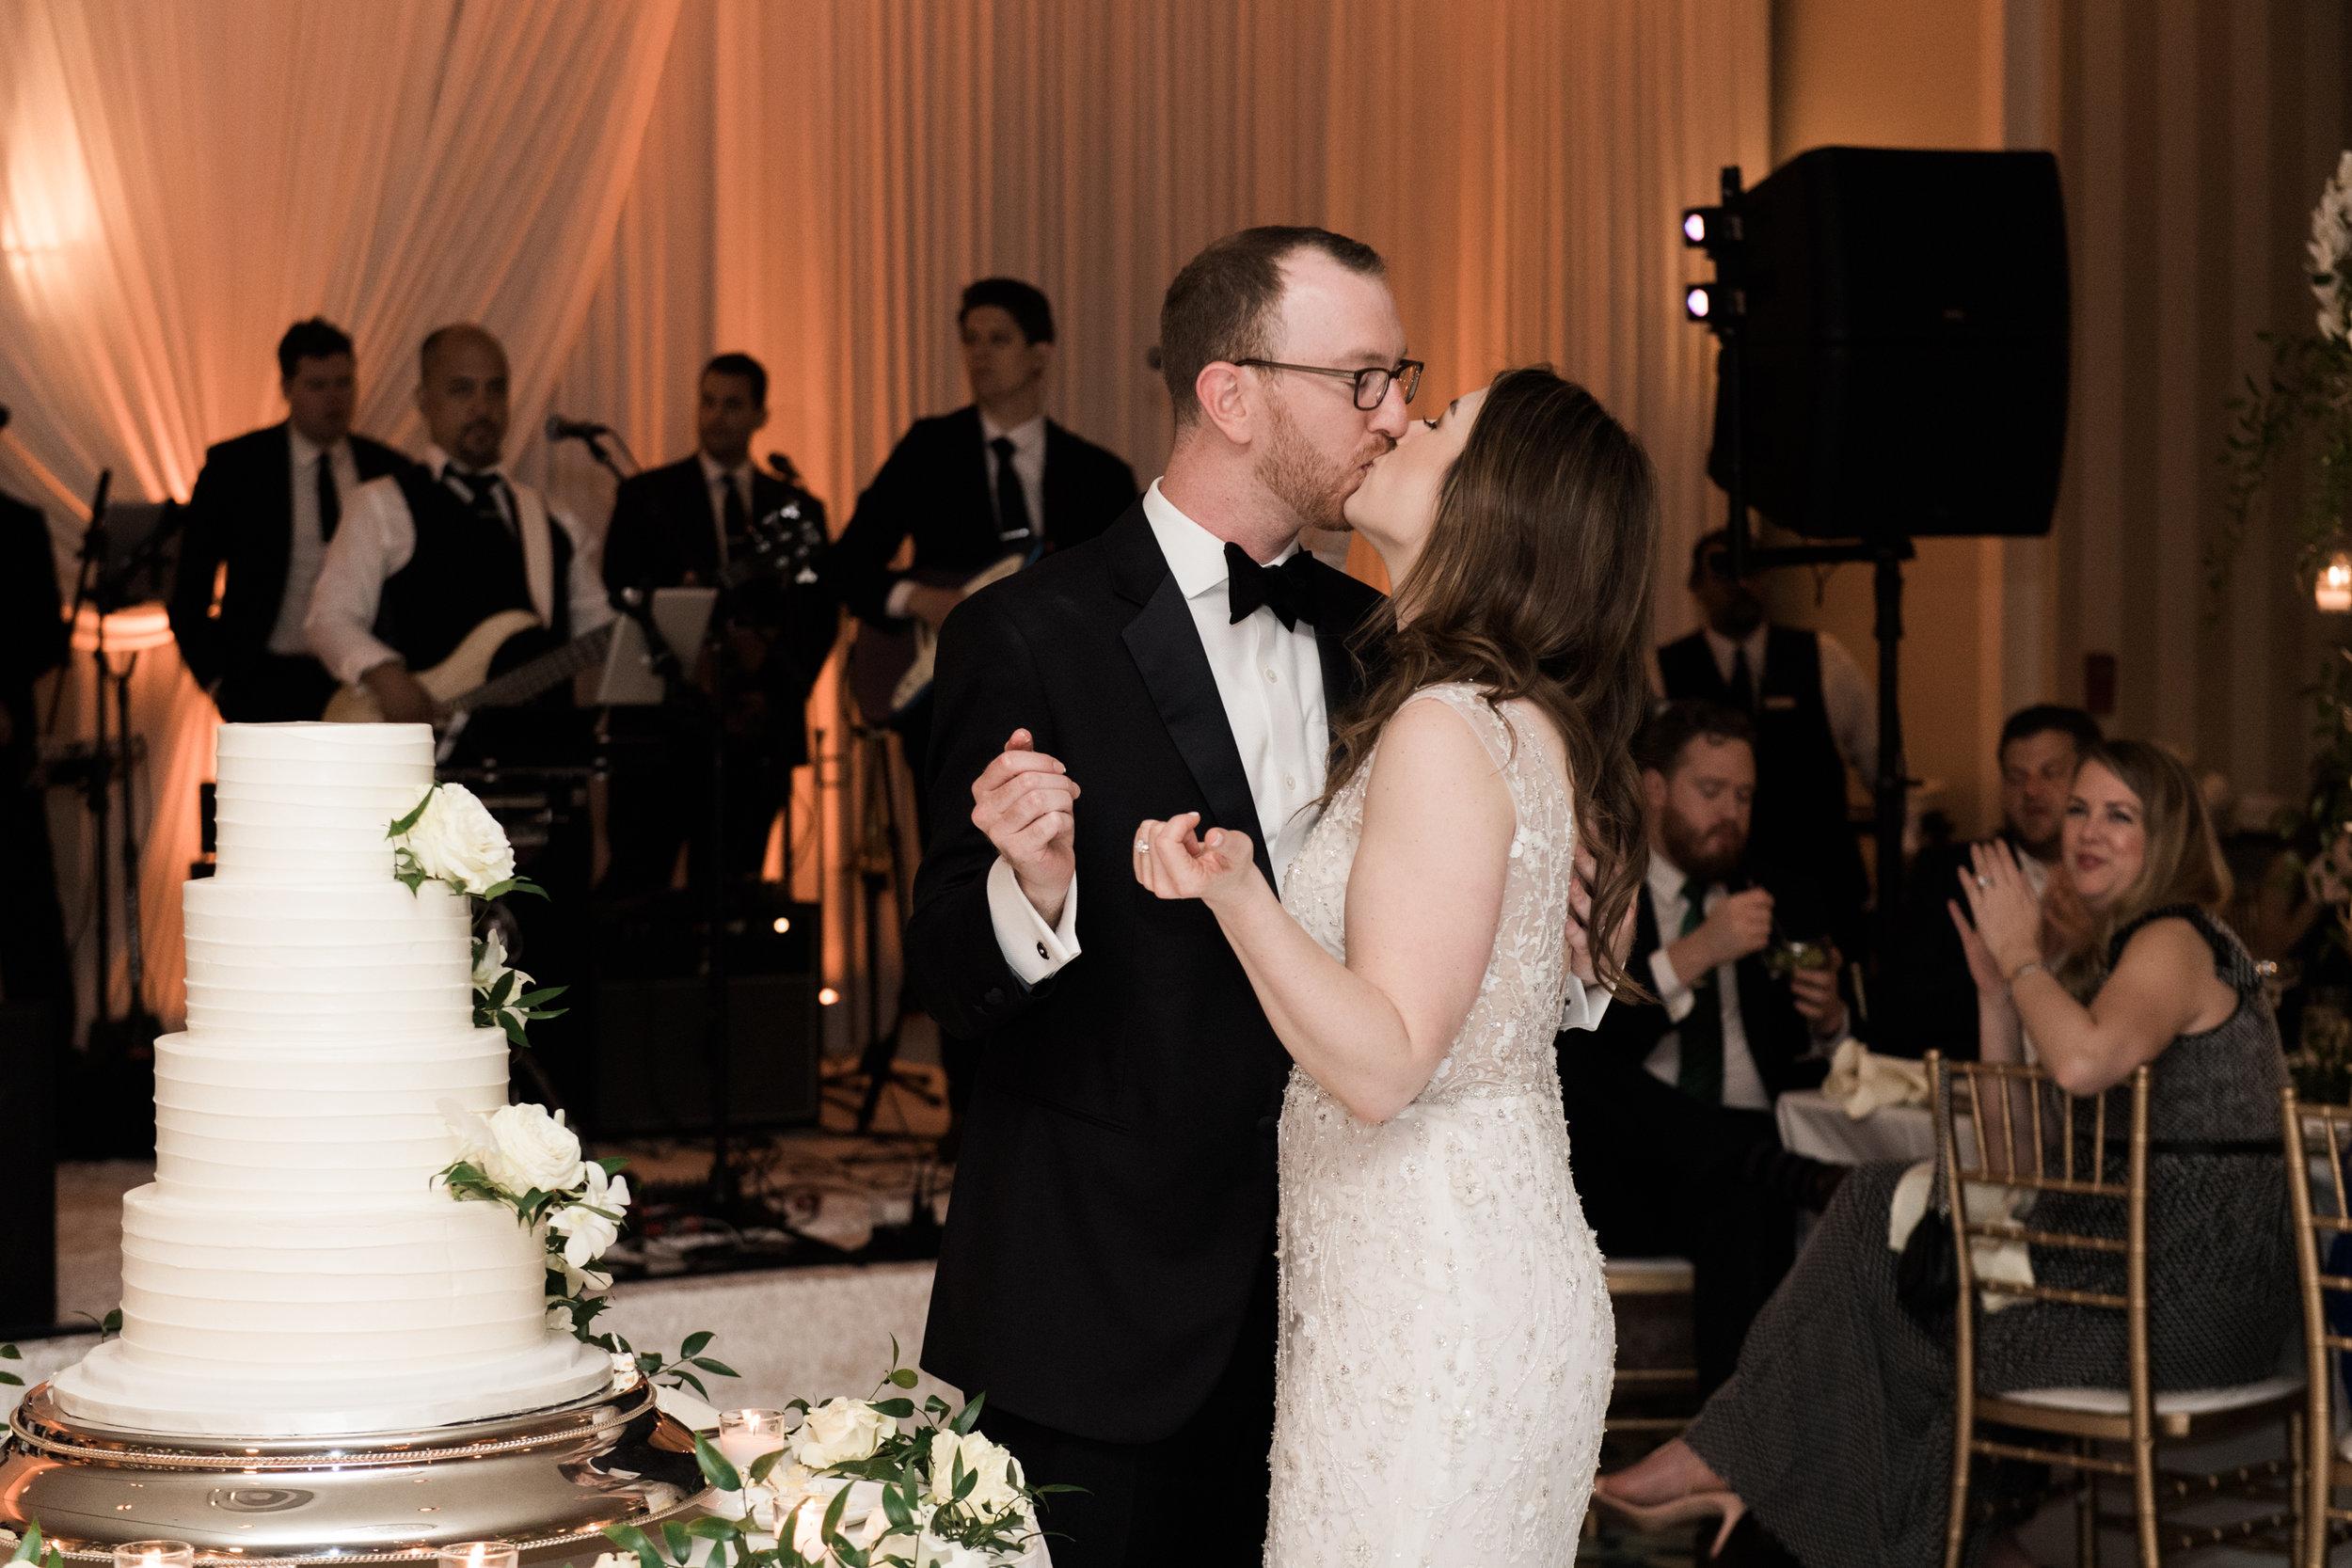 Bonphotage Chicago Wedding Photography - Hilton Orrington/Evanston